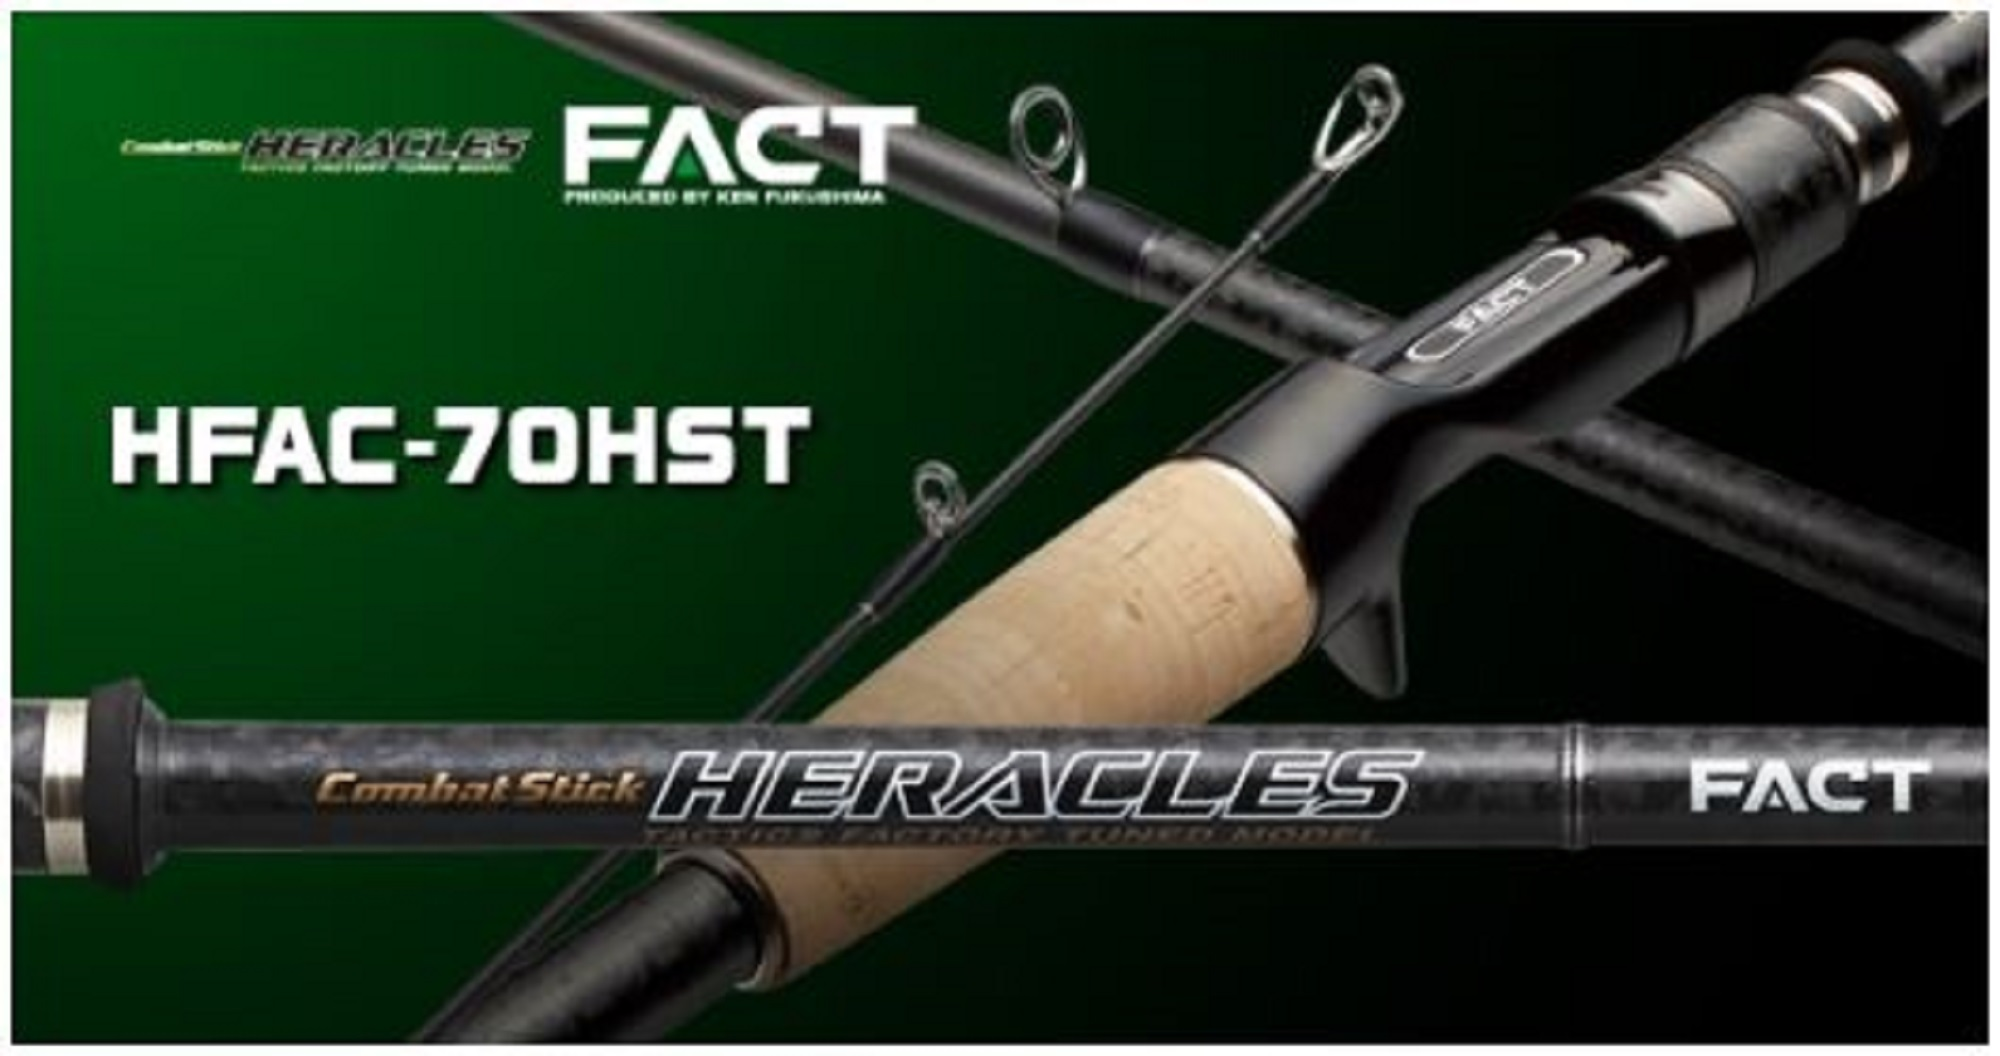 Evergreen Rod Baitcast Heracles Fact HFAC 70 HST (5603)